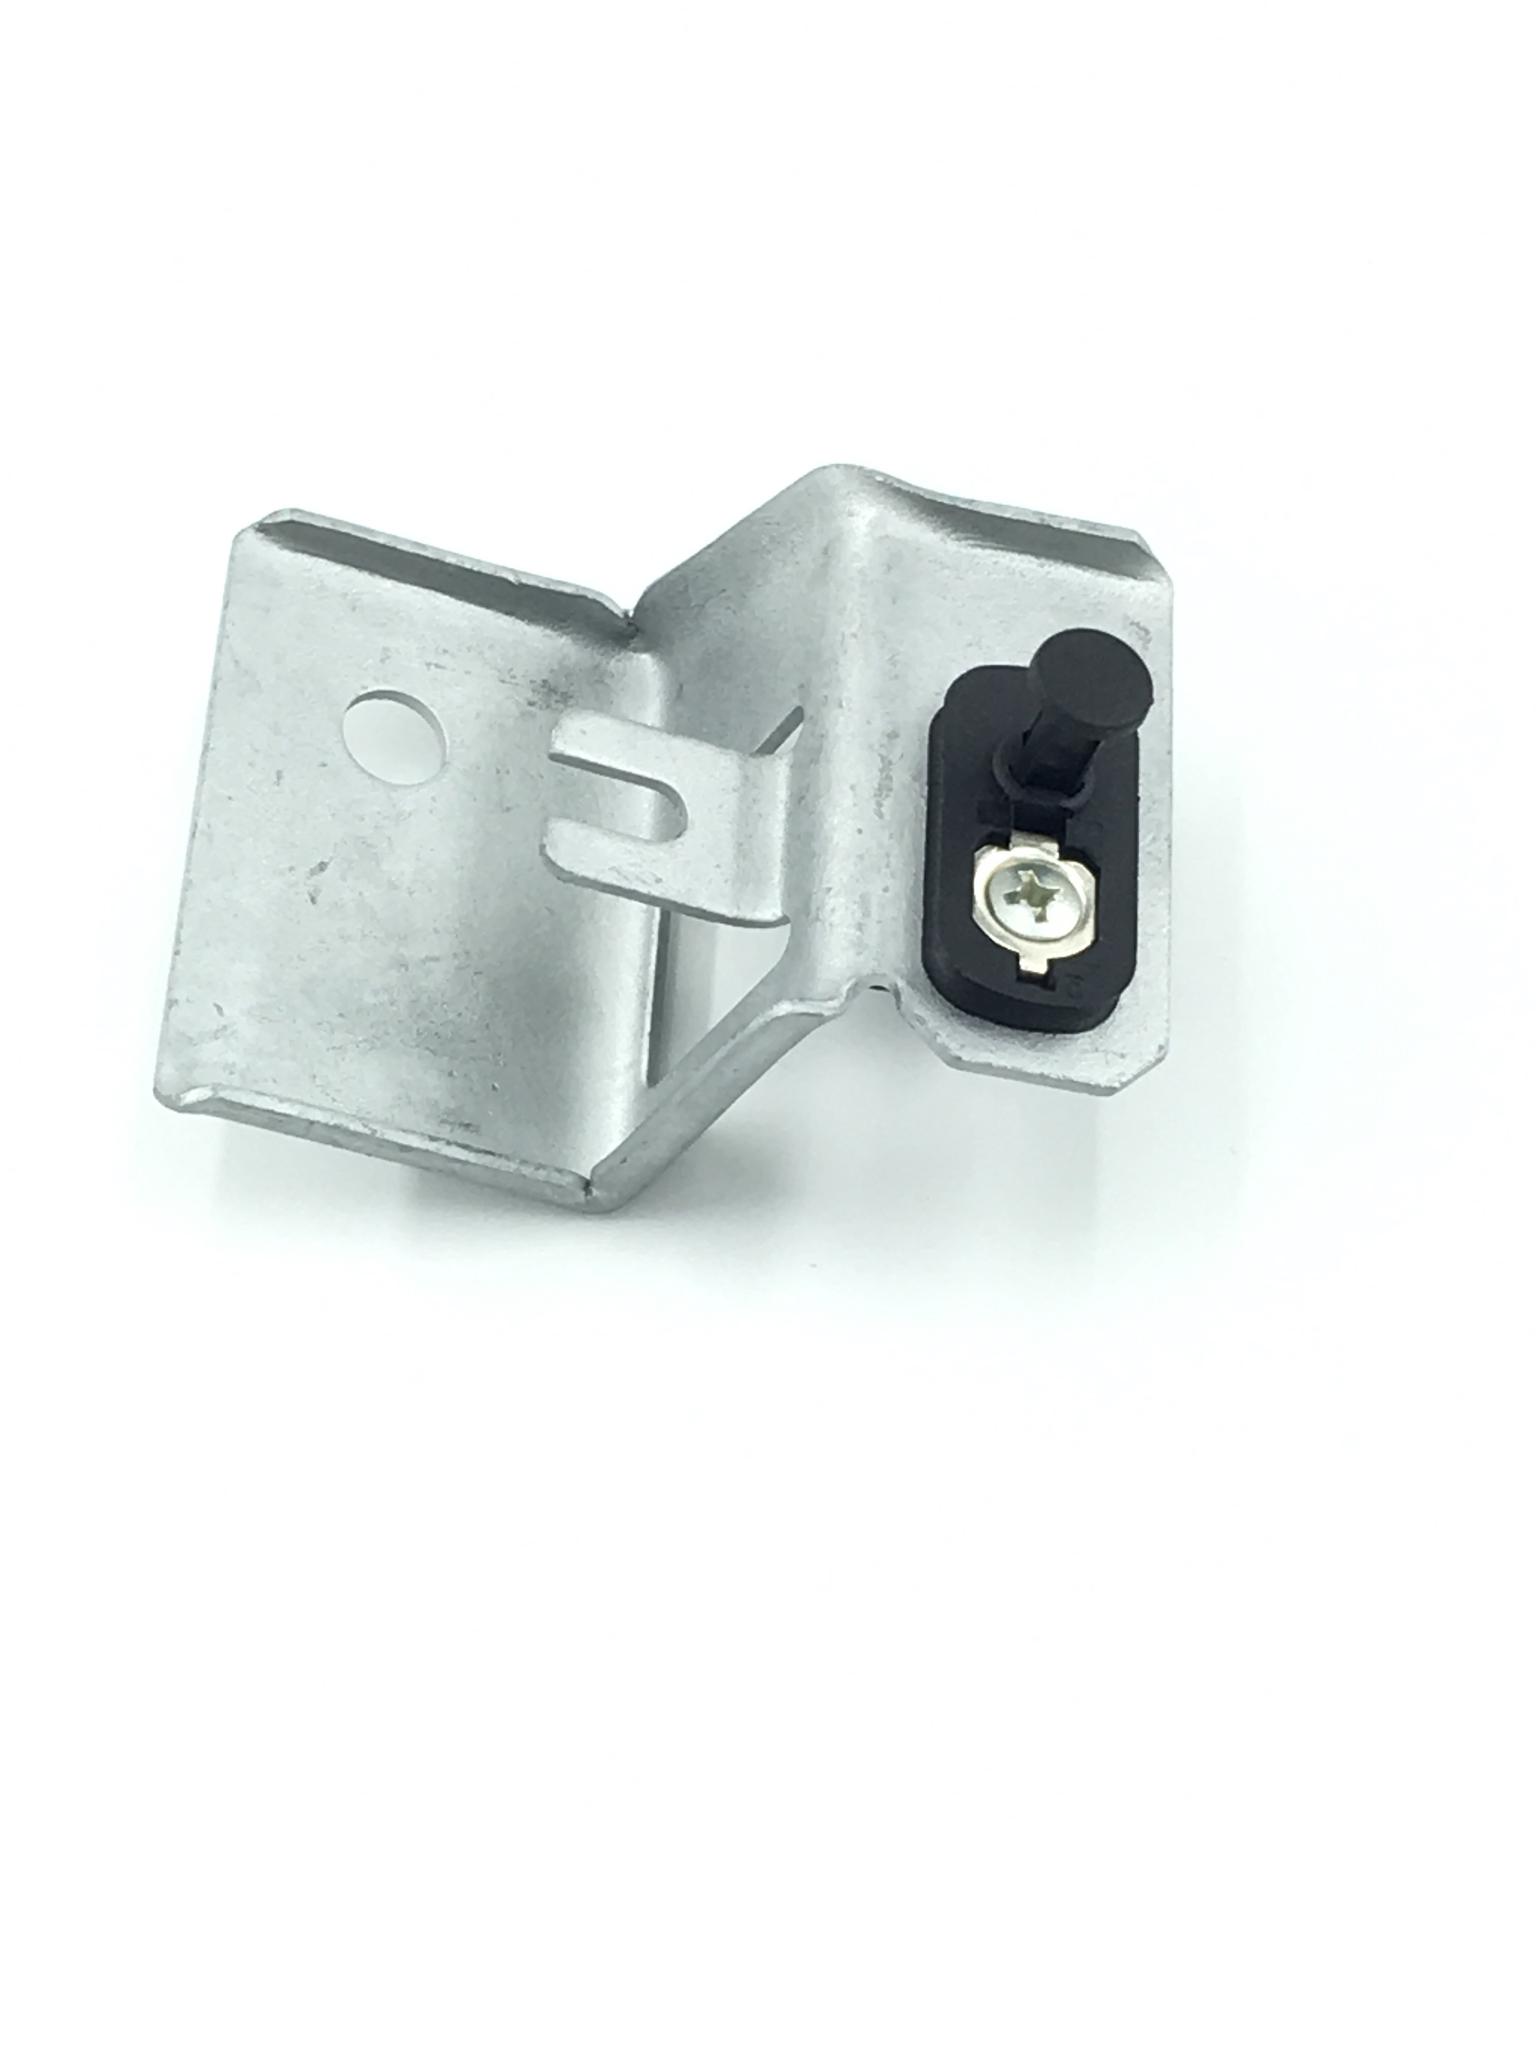 Выключатель ручного тормоза с кронштейном ВАЗ-1118, 2170, 2123, Лада Гранта, Лада Калина 2